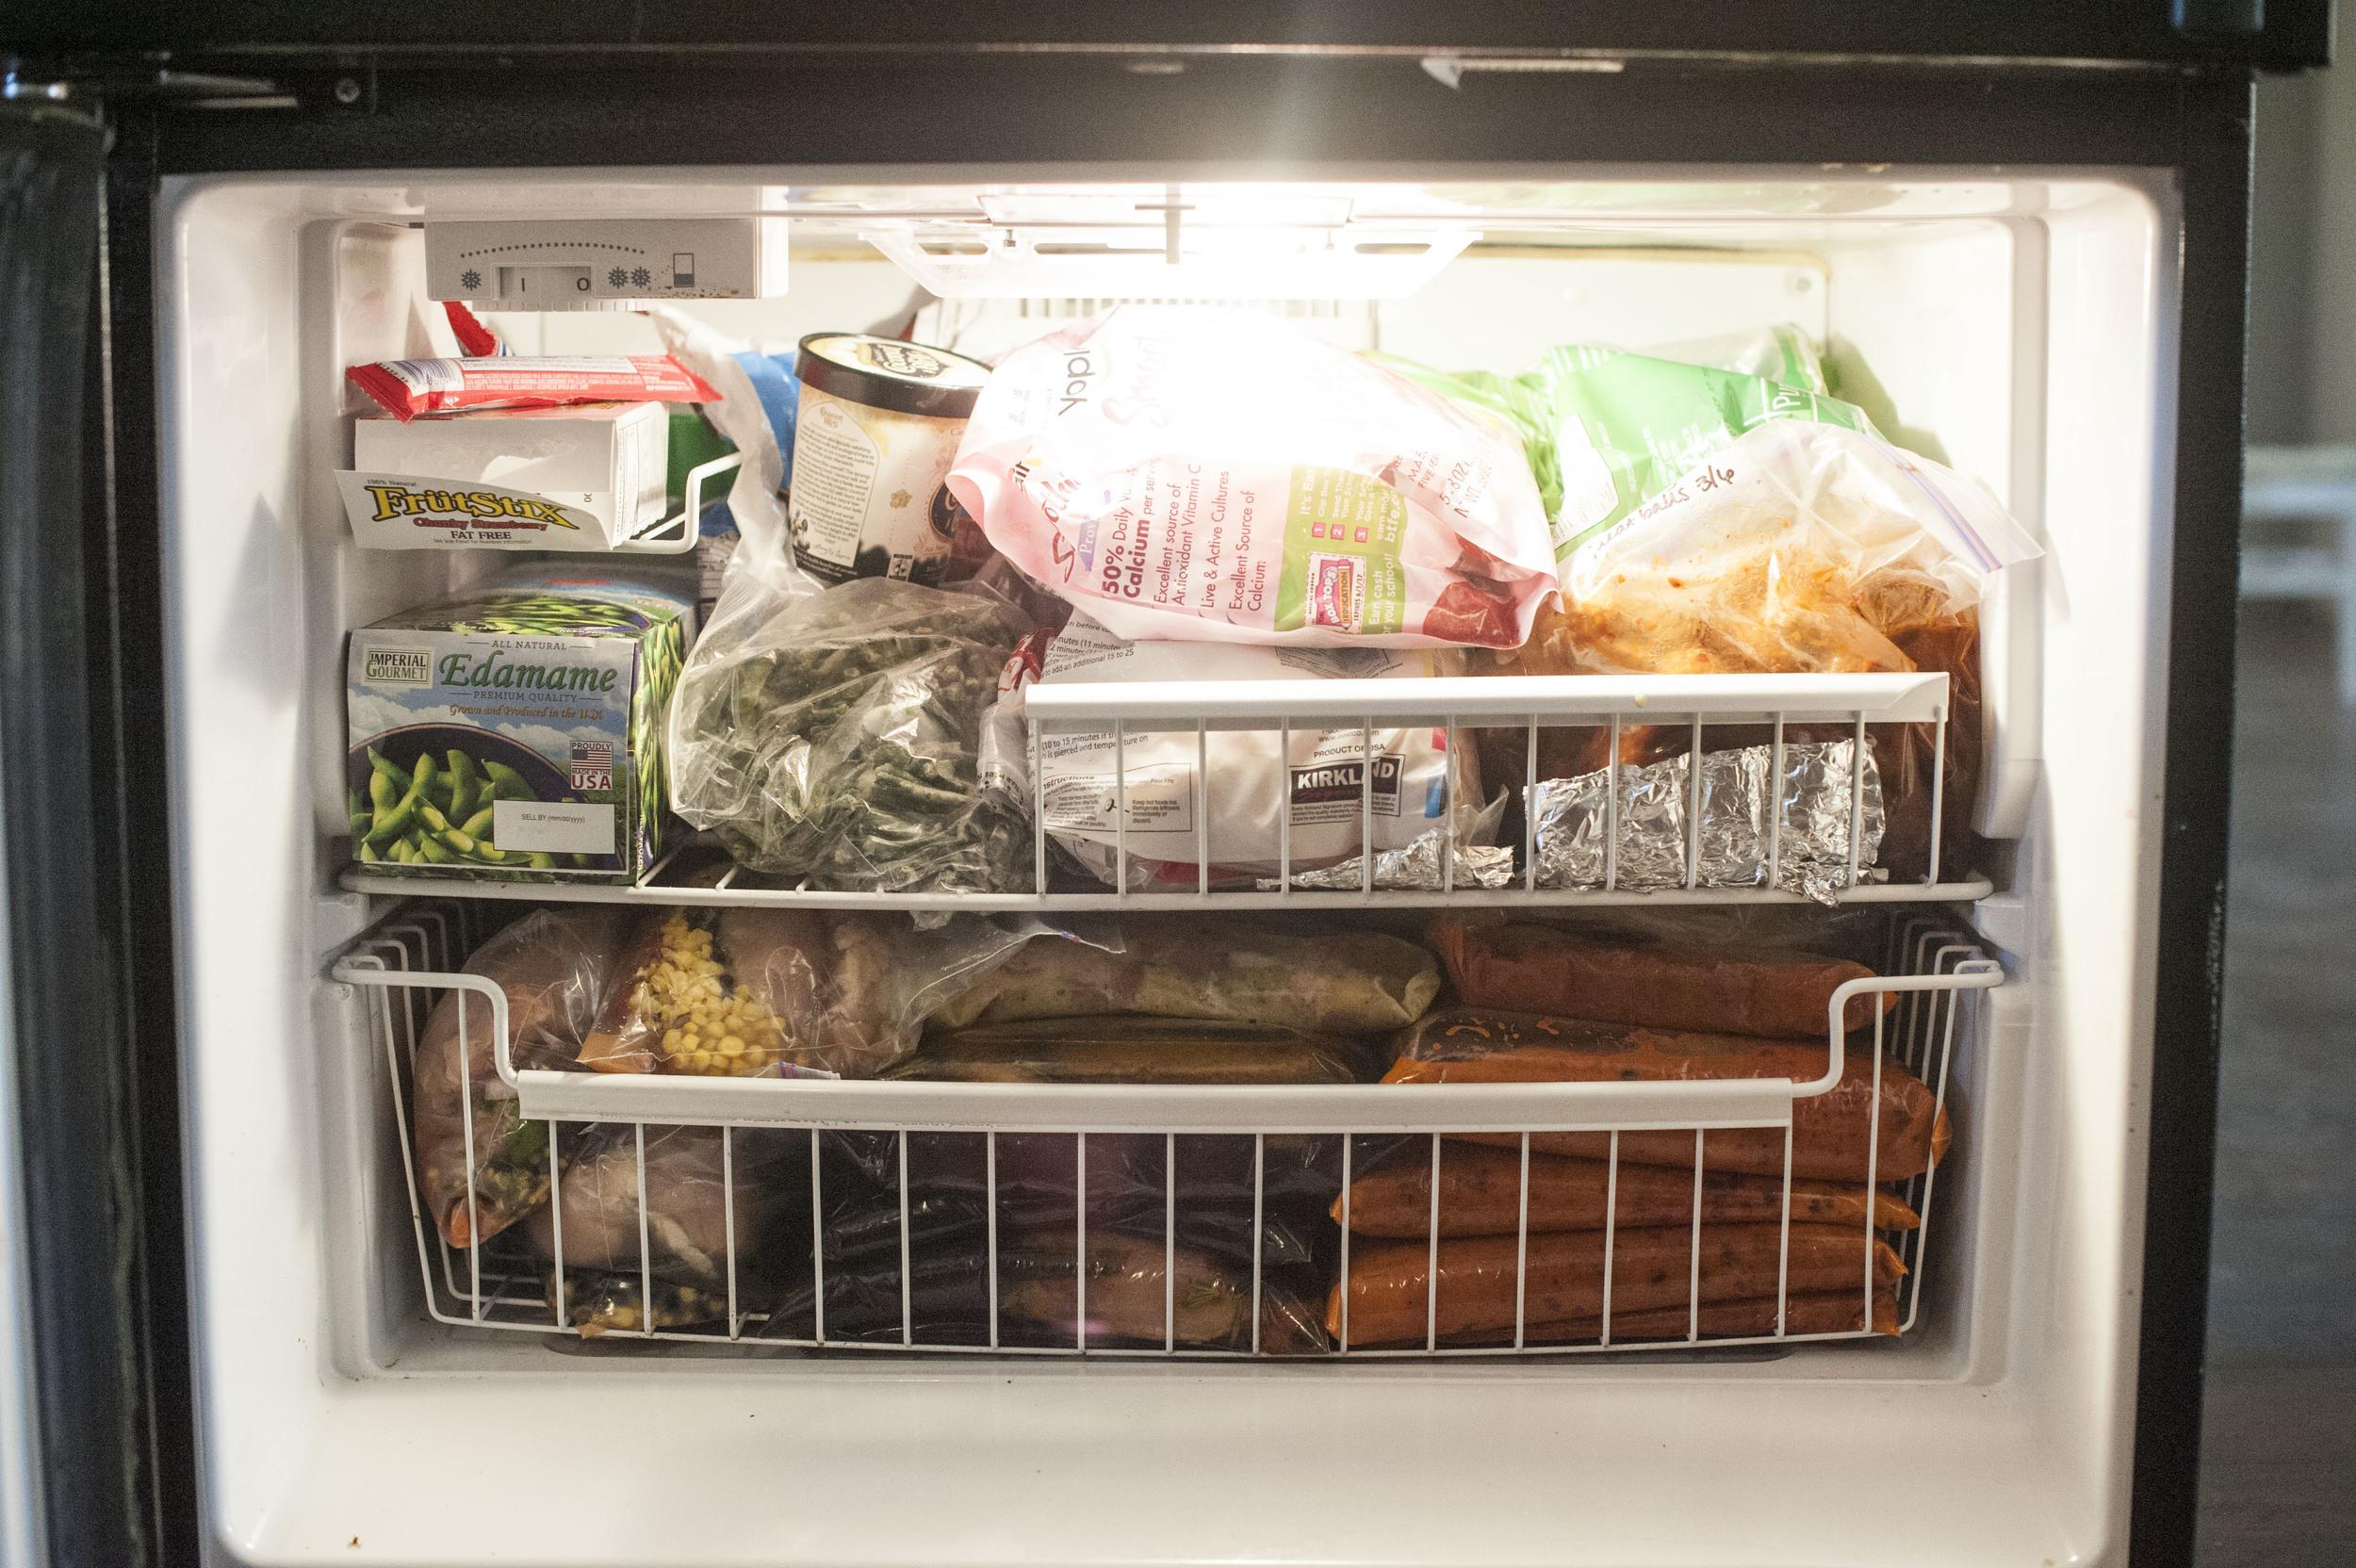 Full freezer = Happy Lissa